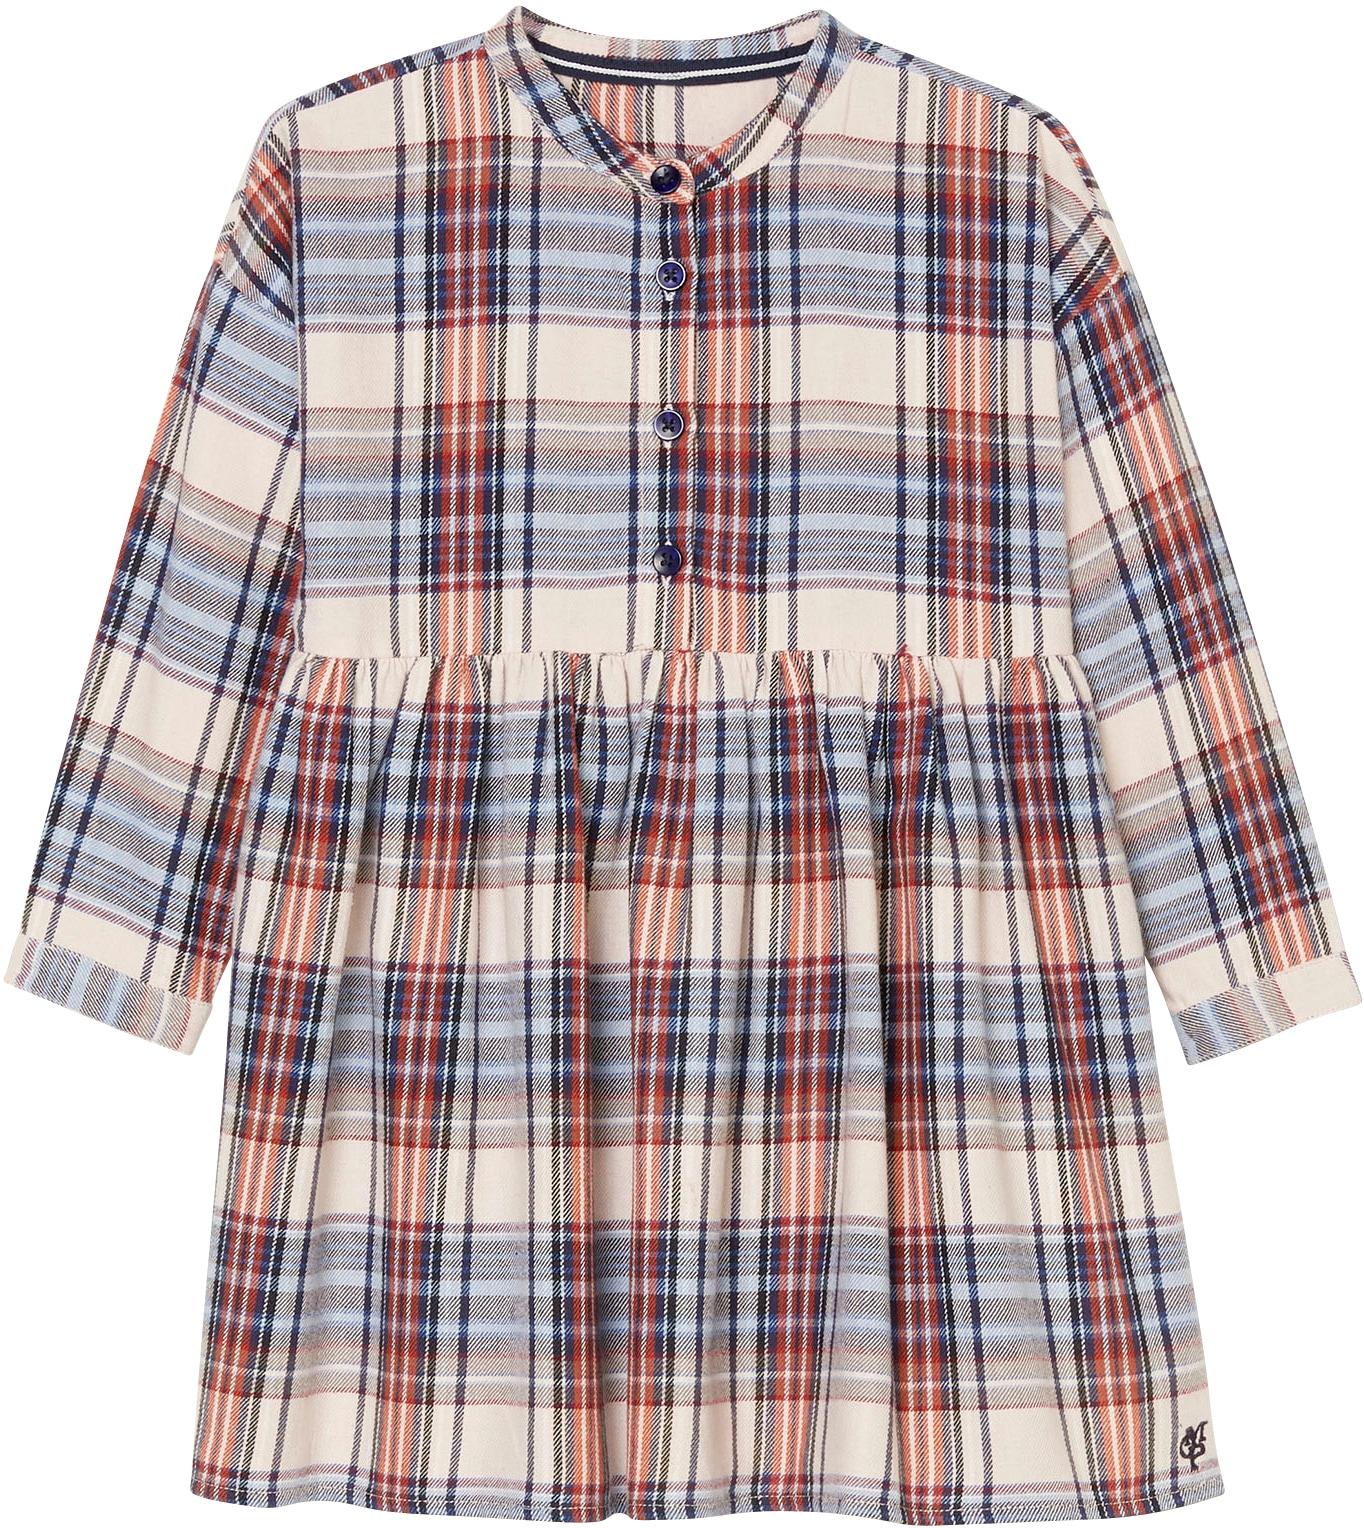 Marc O'Polo Junior Karokleid bunt Mädchen Langarm Kleider Mädchenkleidung